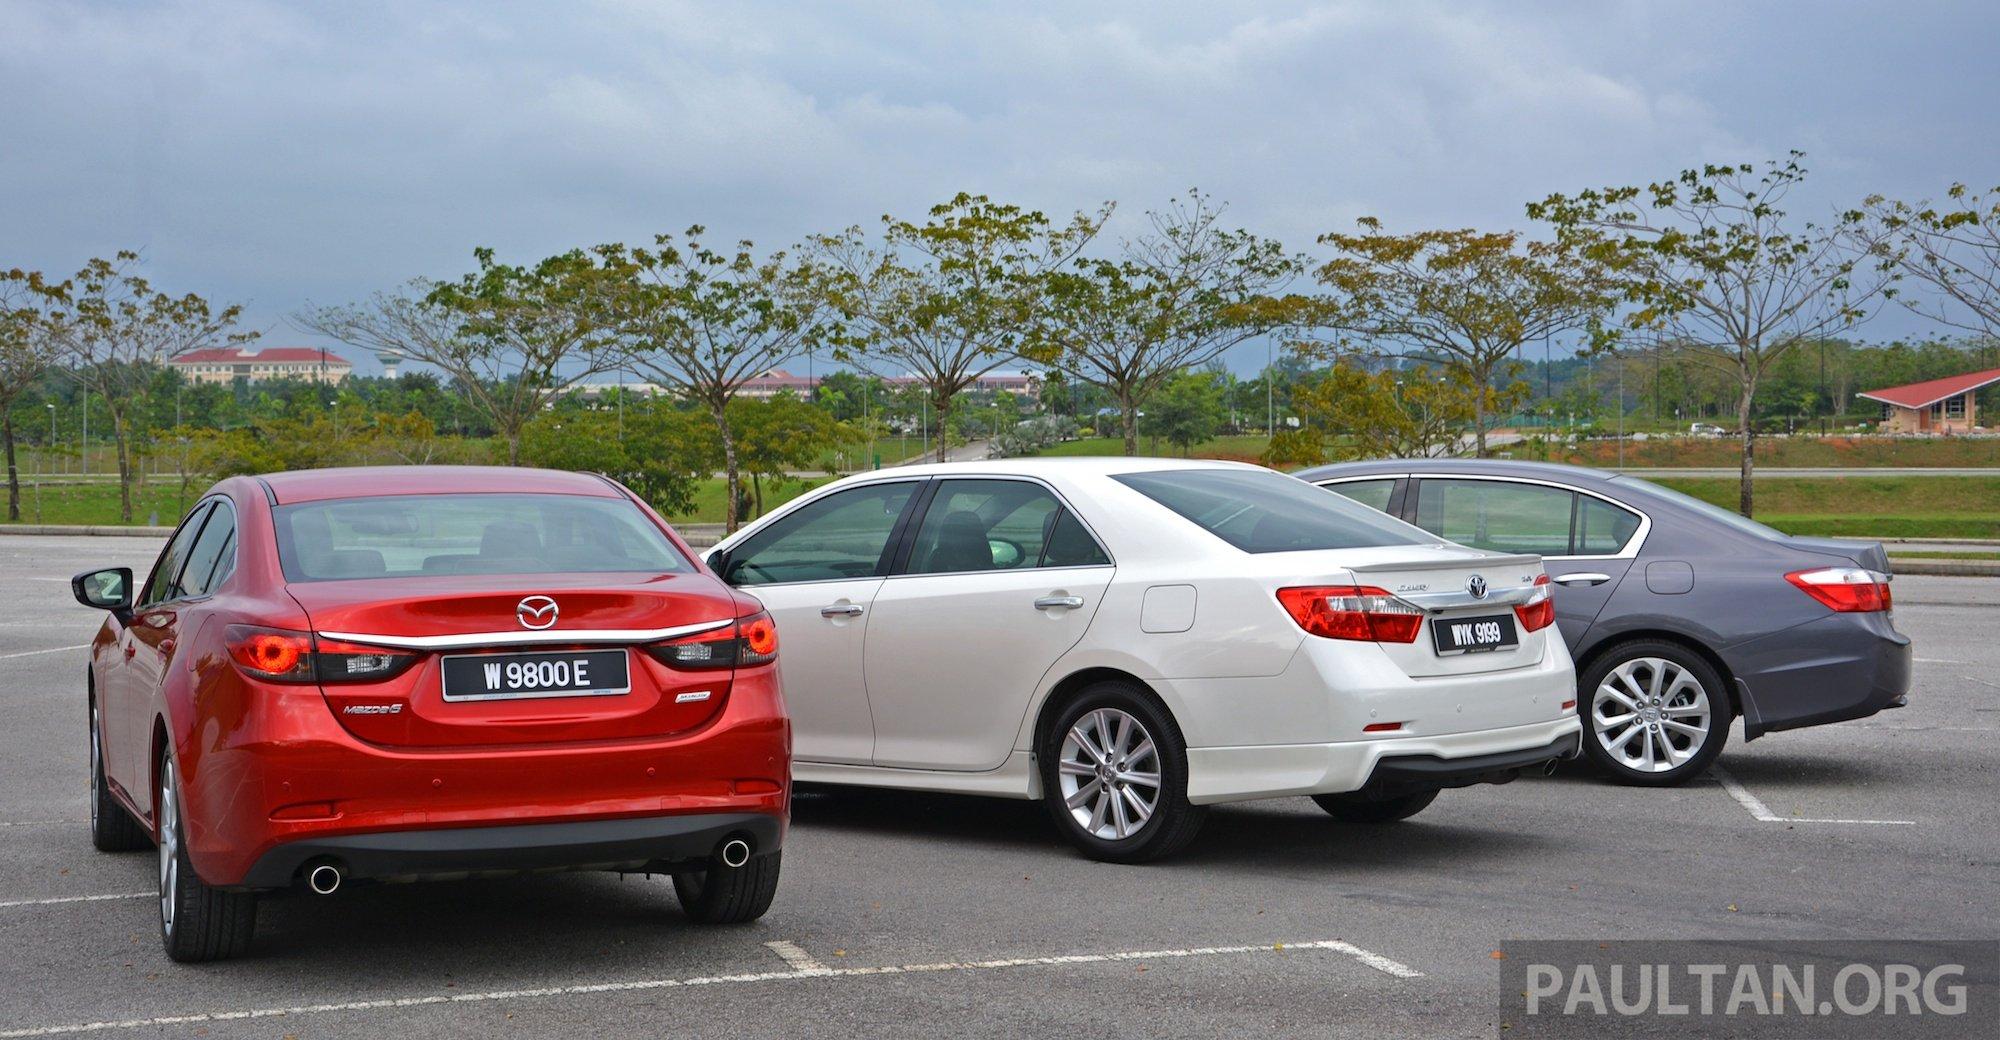 Driven Web Series Episode 5 pany car dilemma – Toyota Camry 2 5